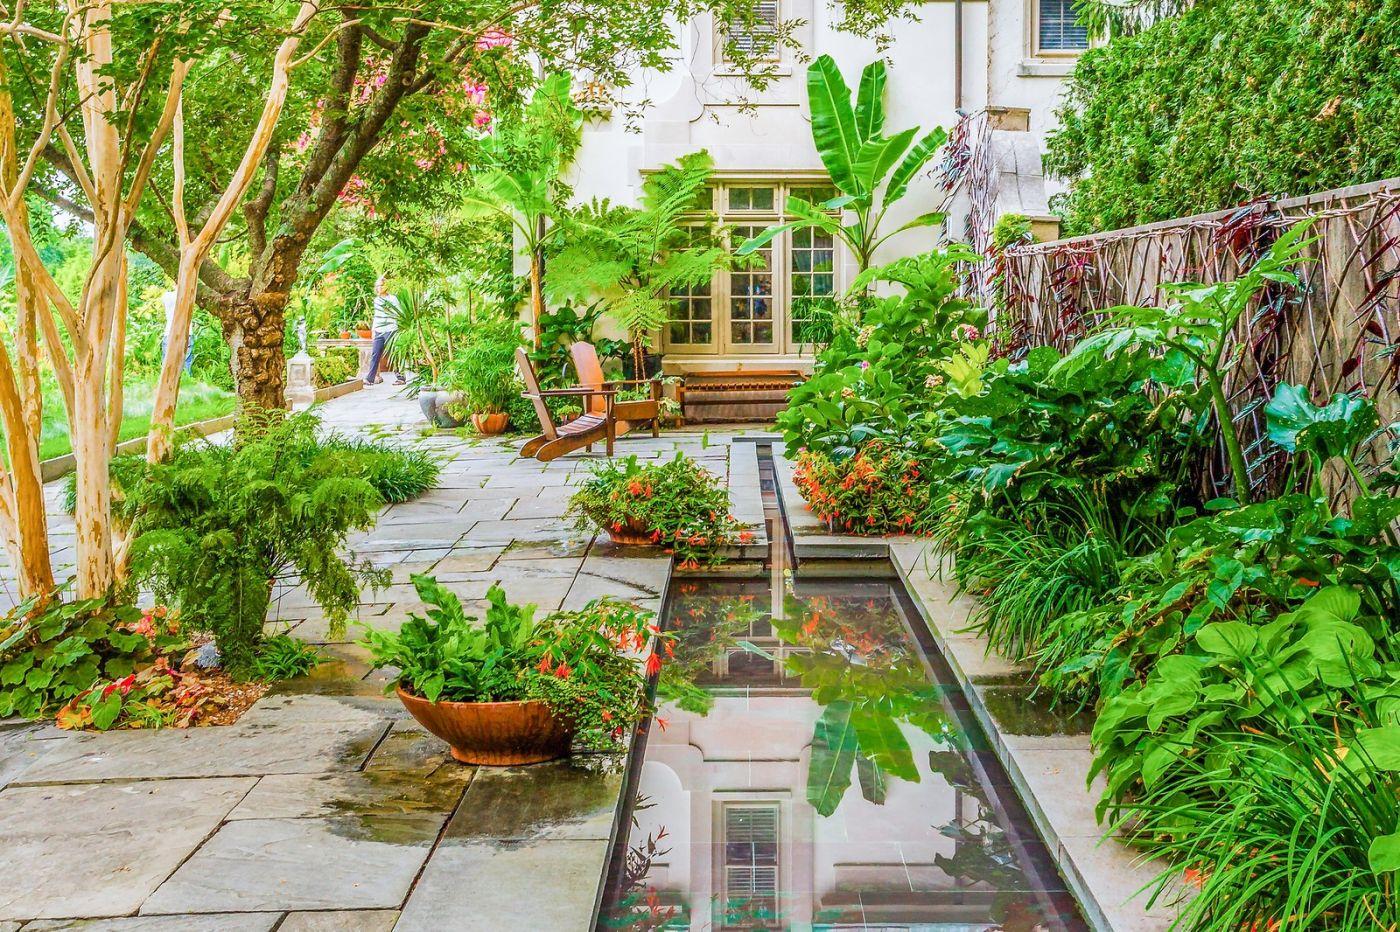 Chanticleer花园,一景一画_图1-24